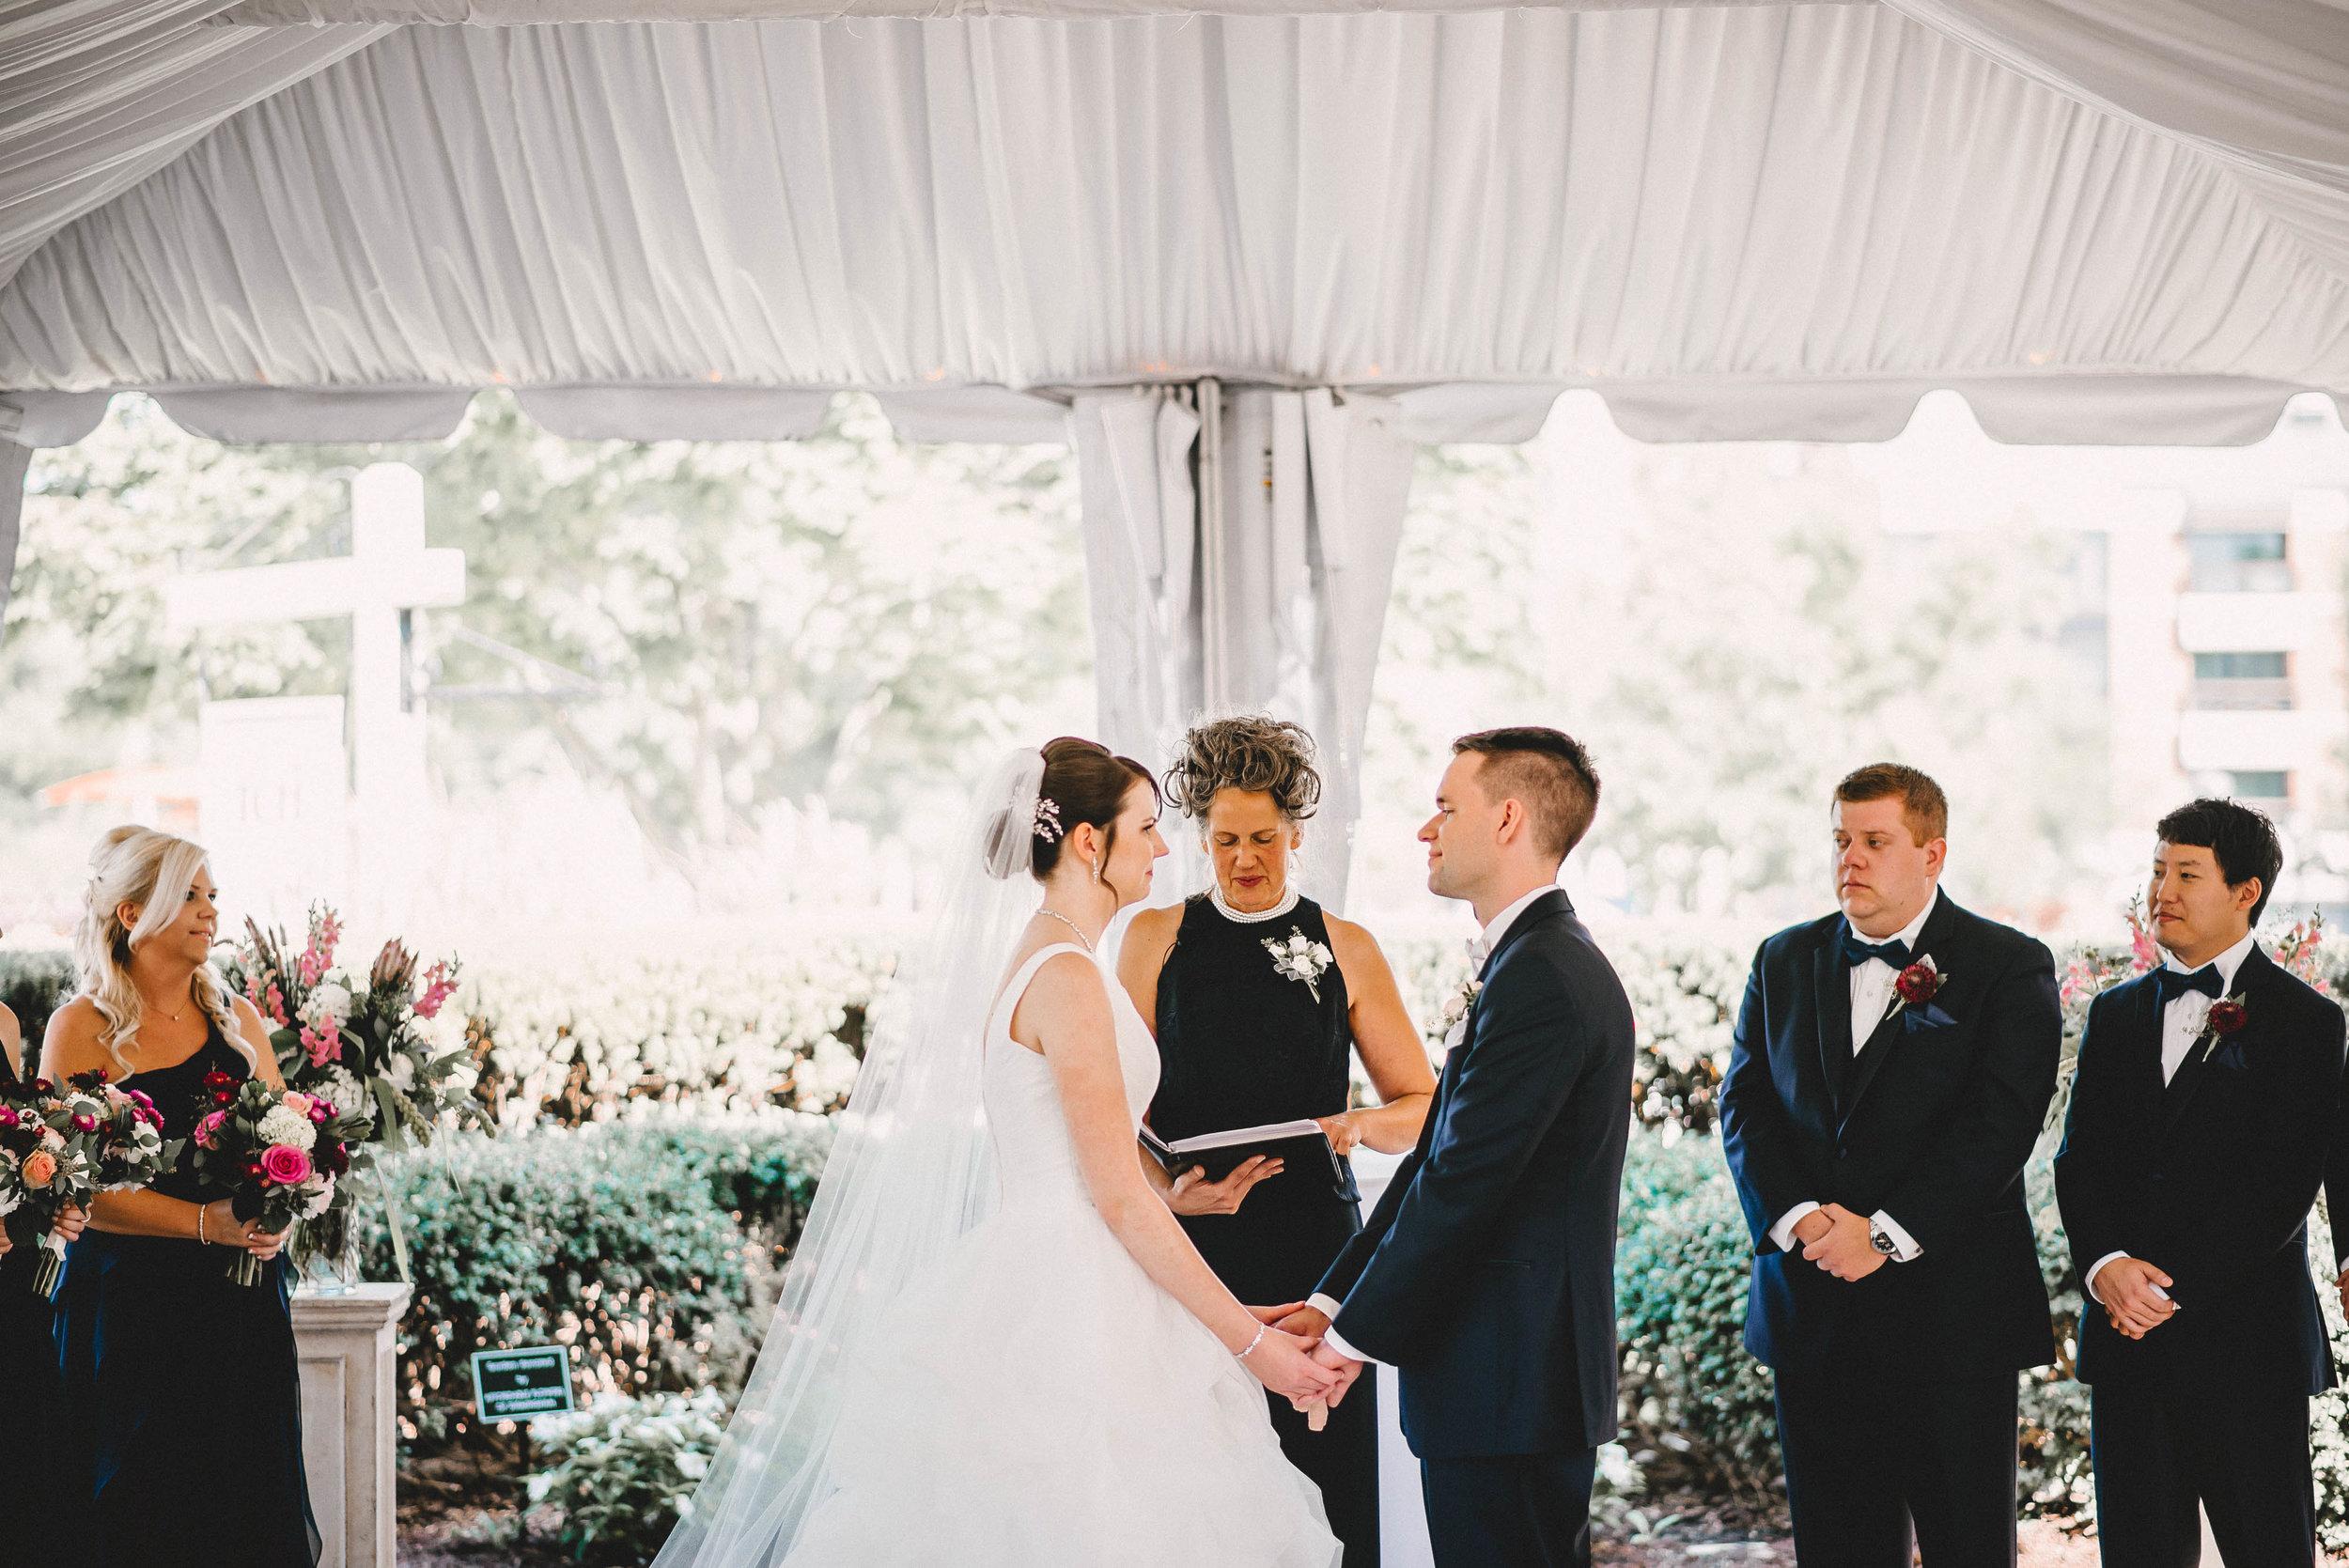 Kara and Mike Wedding-20160904-16-19-52.jpg